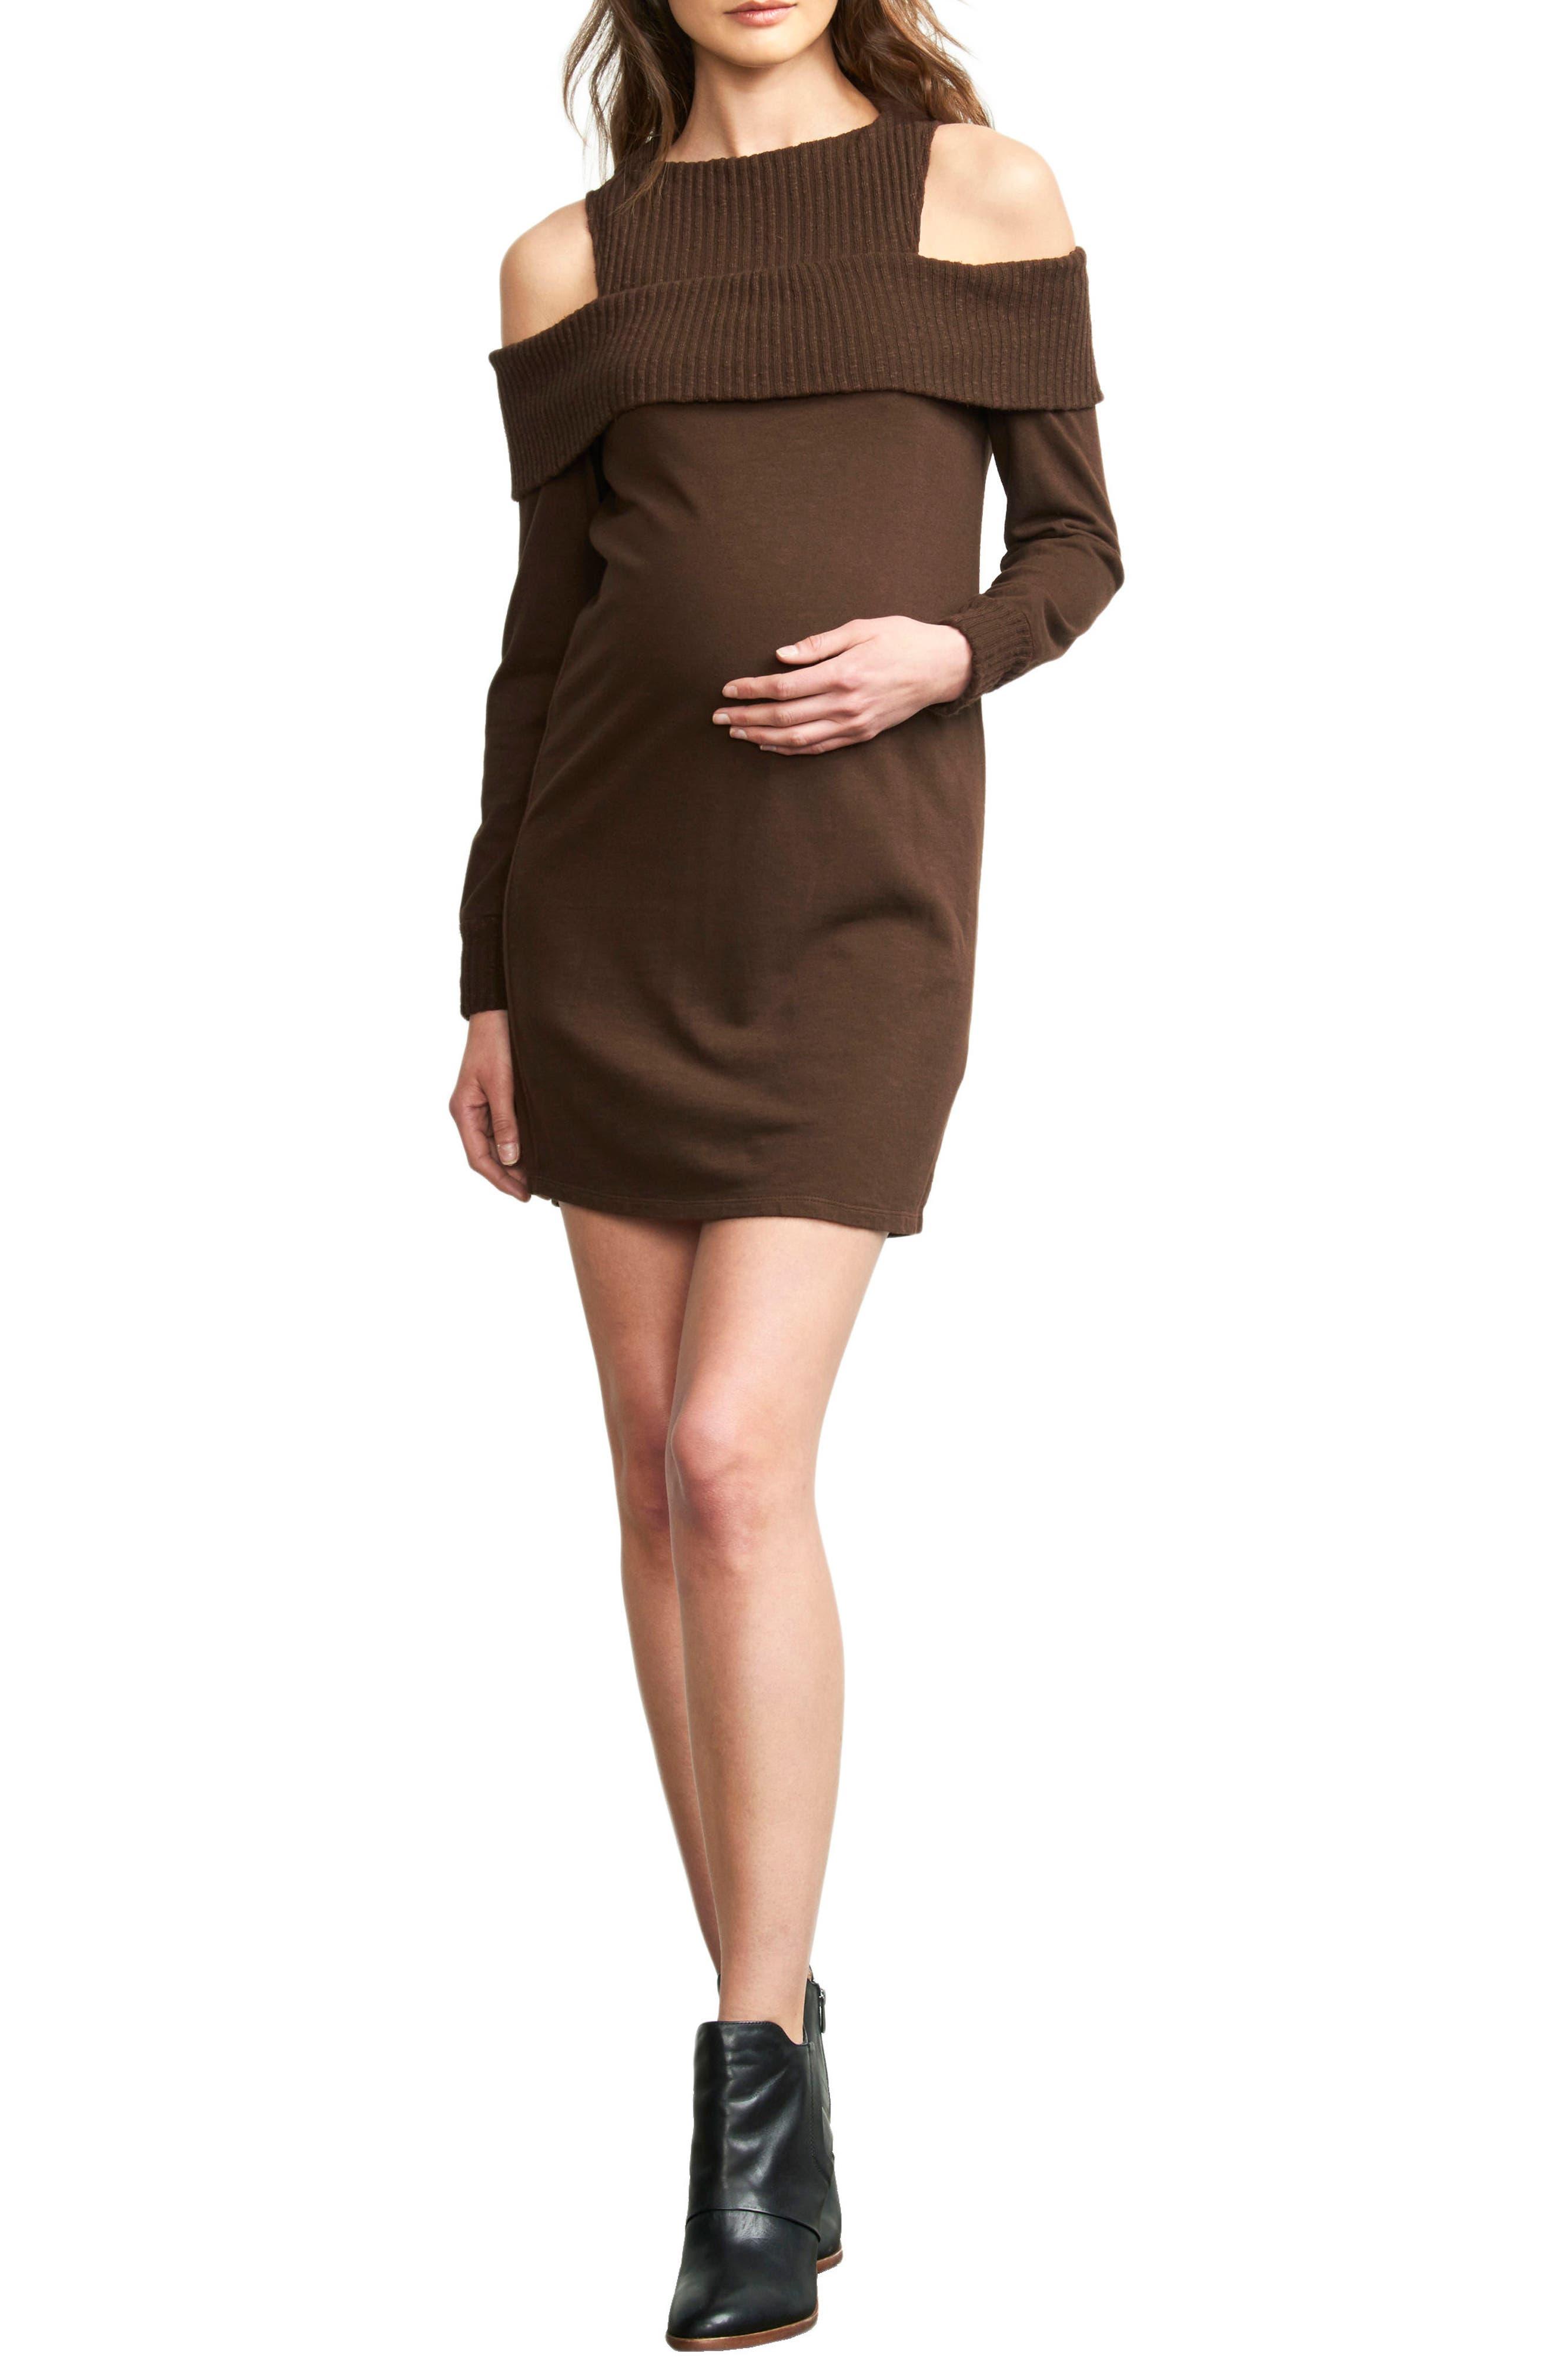 Maternal America Rib Detail Cold Shoulder Maternity Dress, Brown